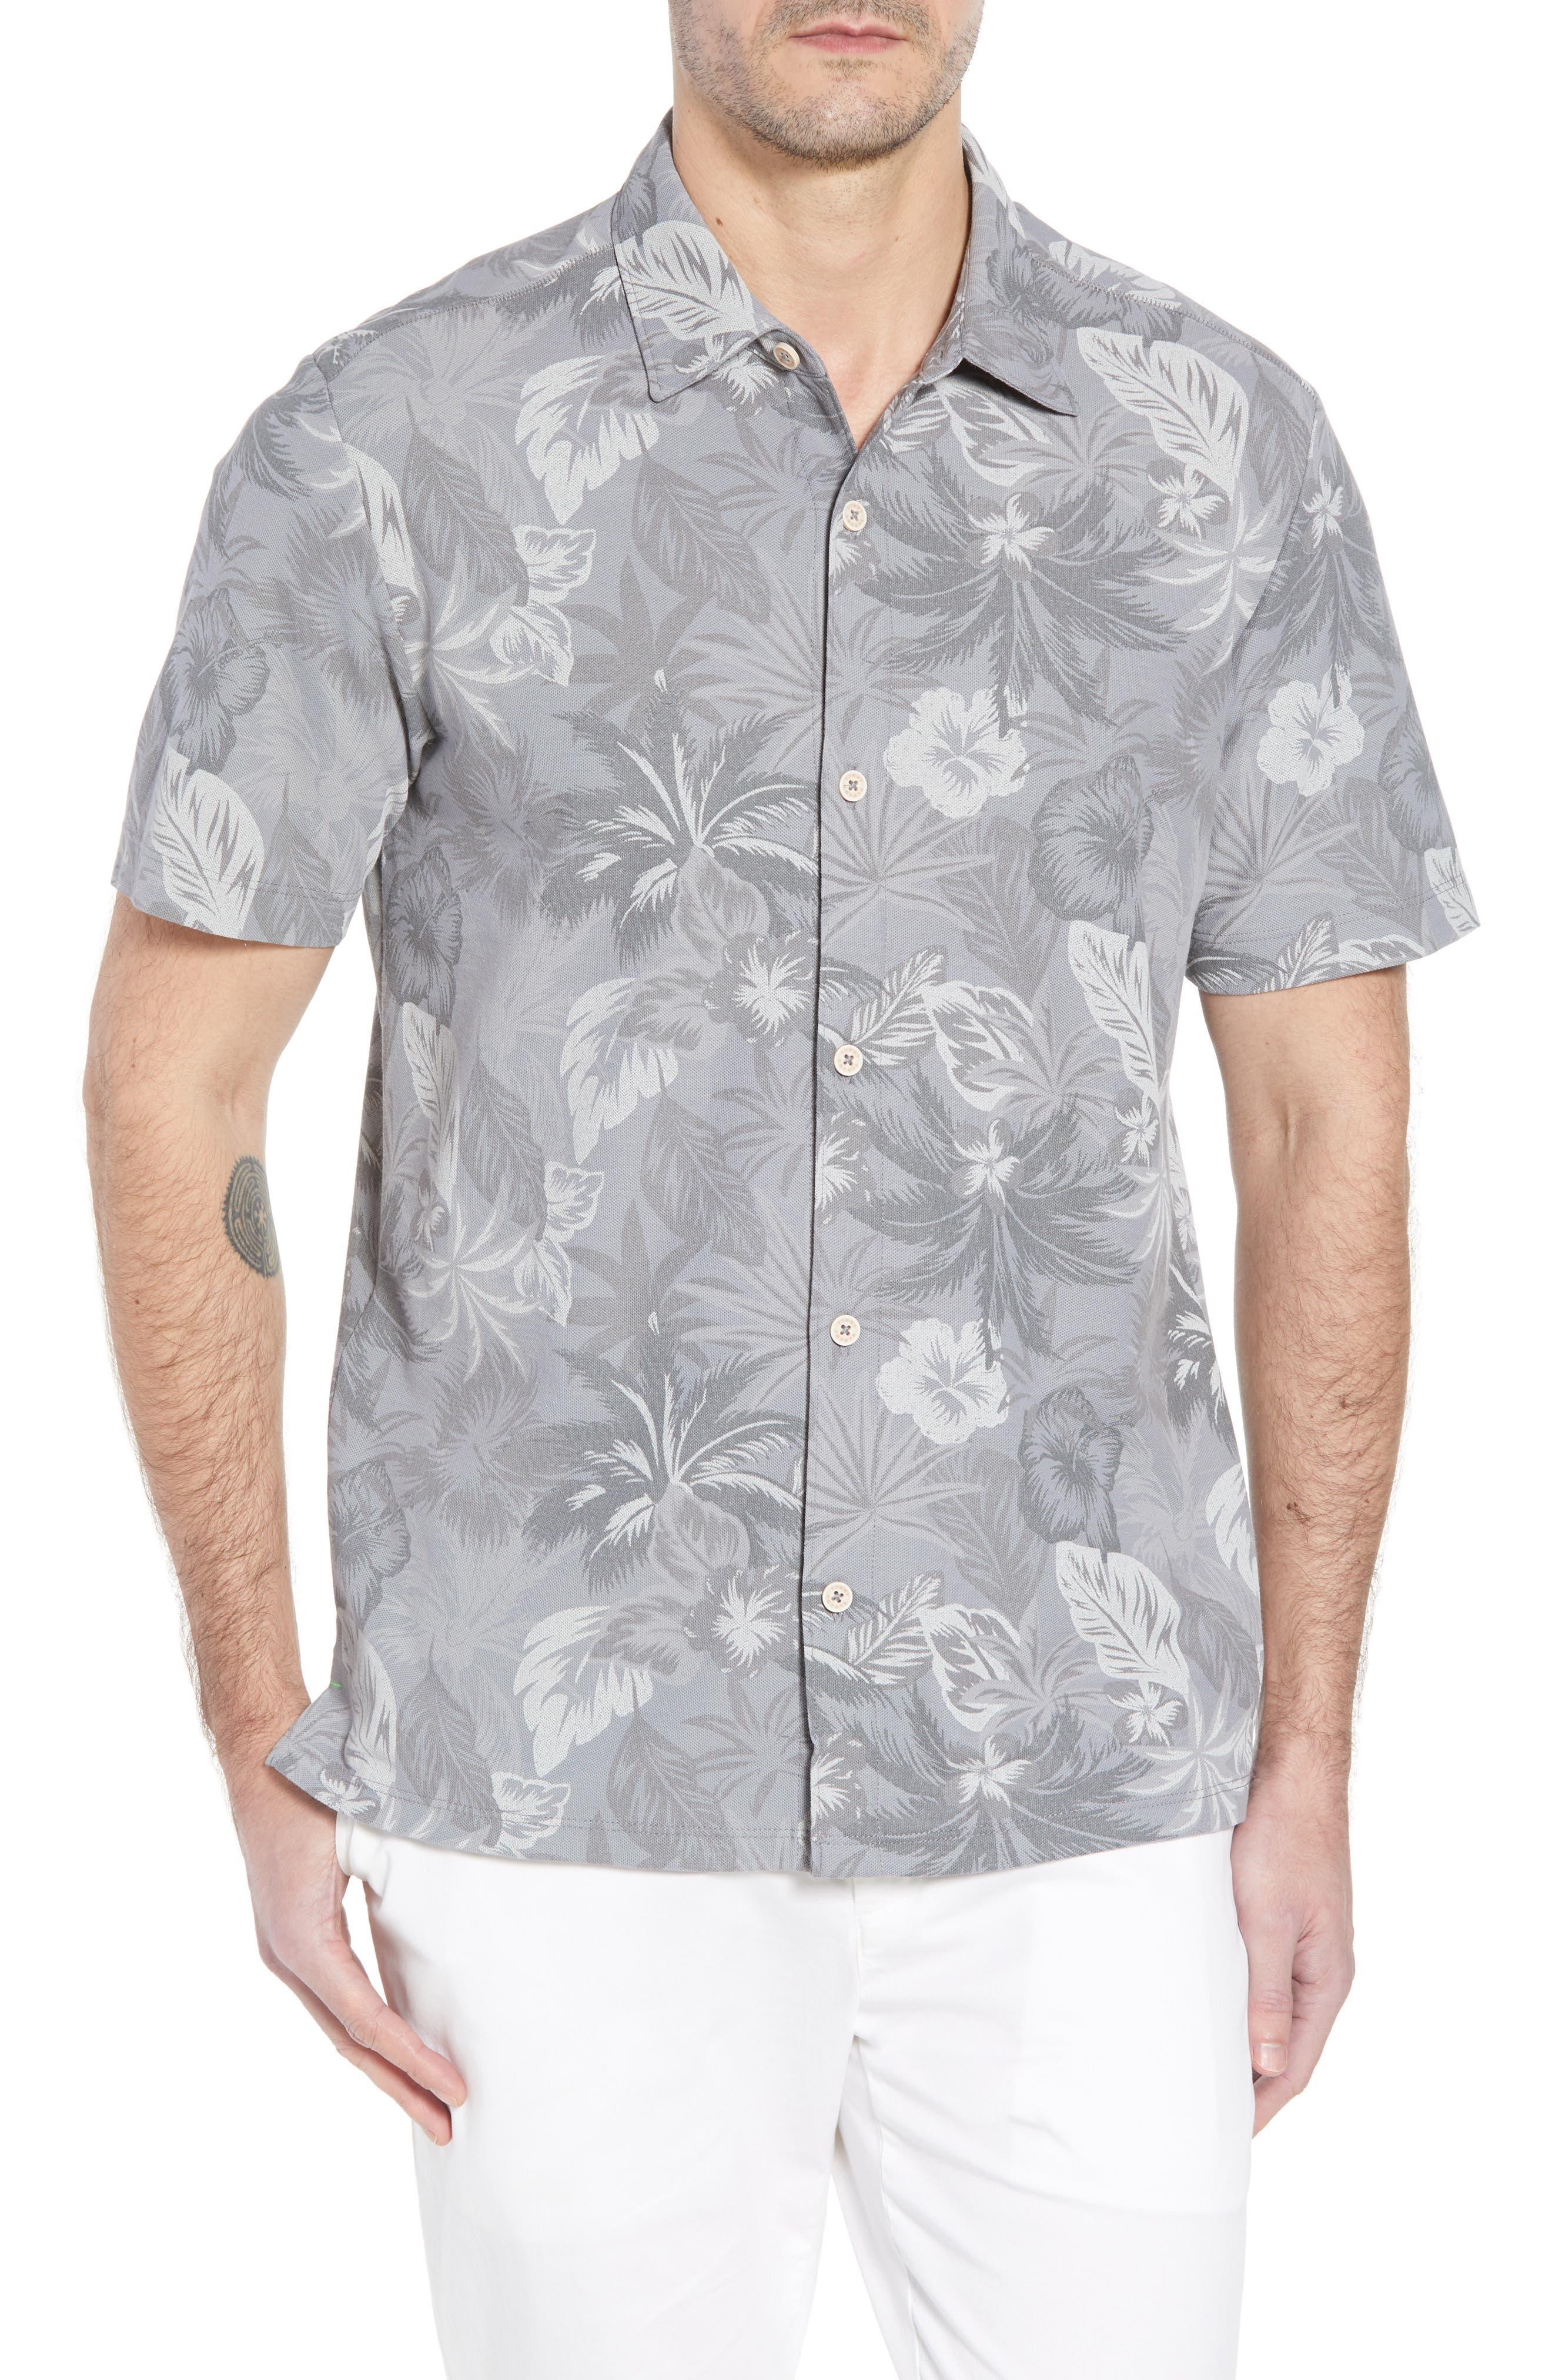 Fuego Floral Camp Shirt,                             Main thumbnail 1, color,                             Iced Slate